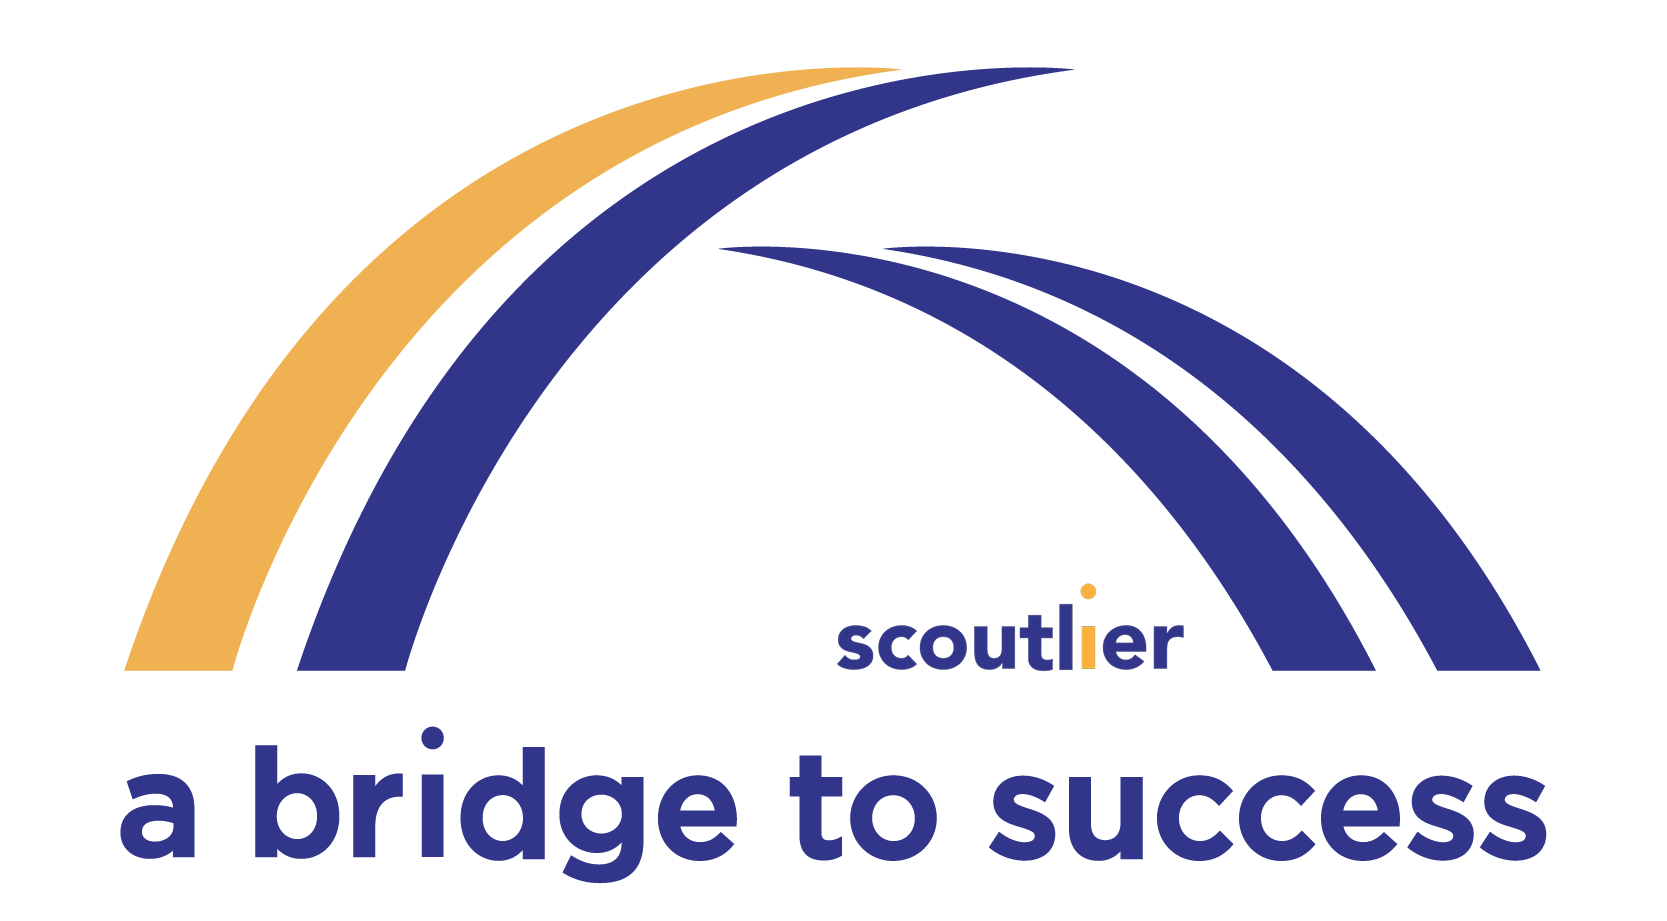 scoutlier-a-bridge-to-success-logo-rgb